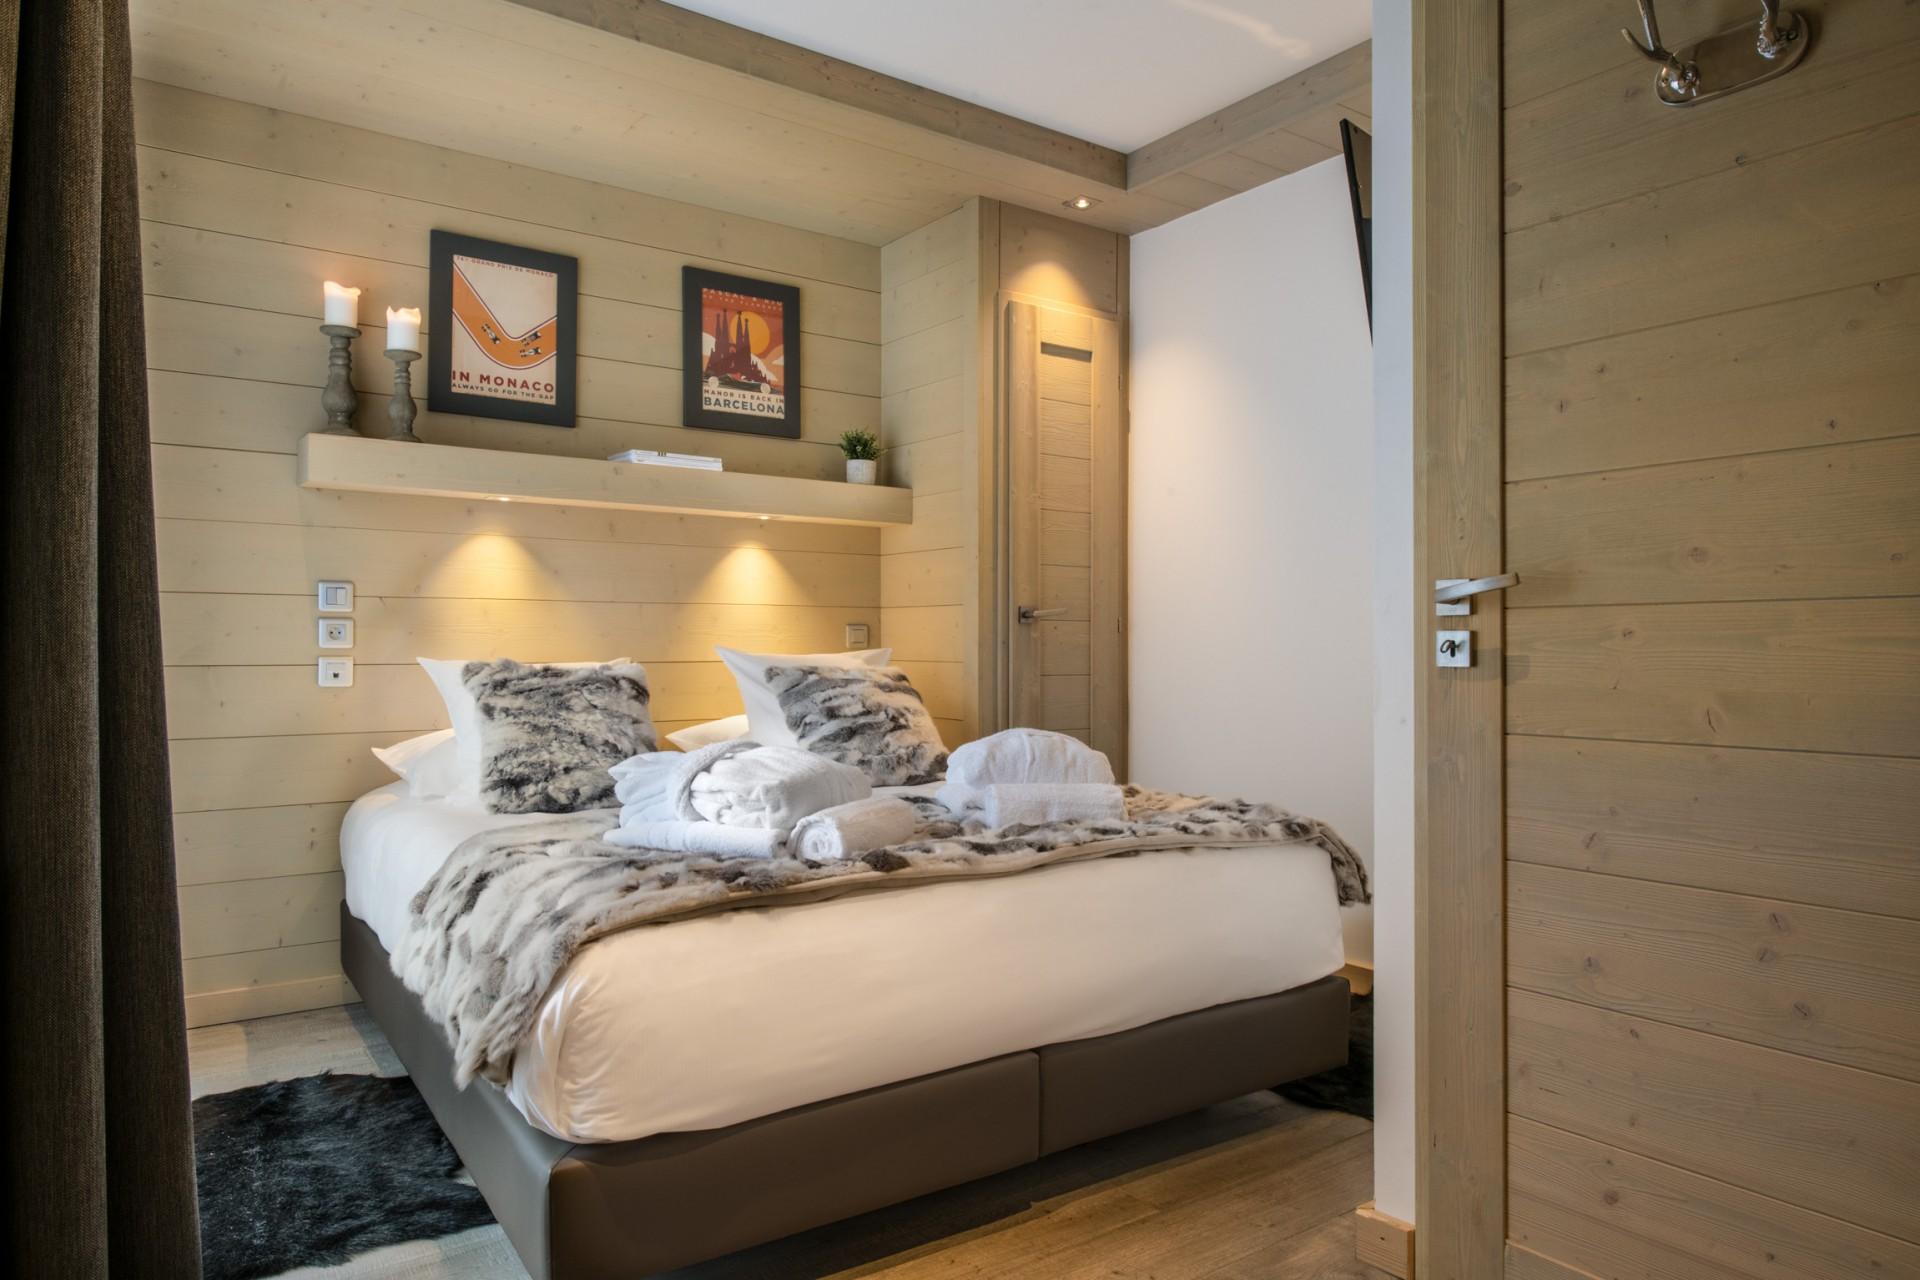 Courchevel 1650 Location Appartement Luxe Alsolite Chambre 3